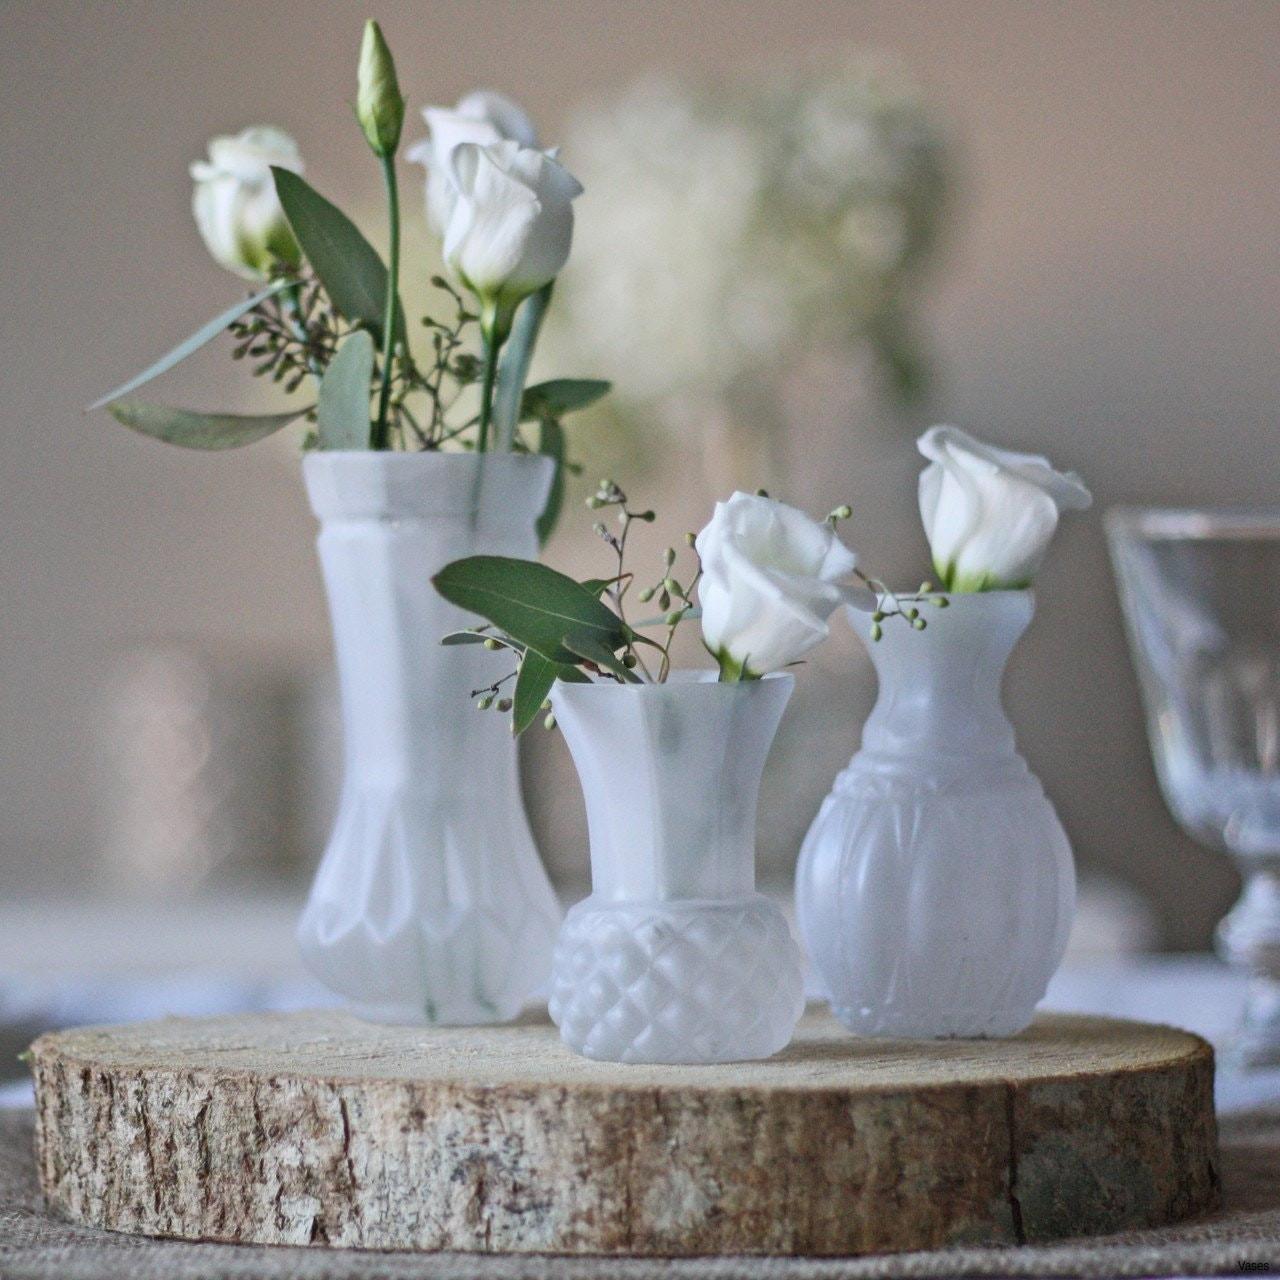 tulip bulbs in glass vase of awesome jar flower 1h vases bud wedding vase centerpiece idea i 0d pertaining to awesome jar flower 1h vases bud wedding vase centerpiece idea i 0d white of awes